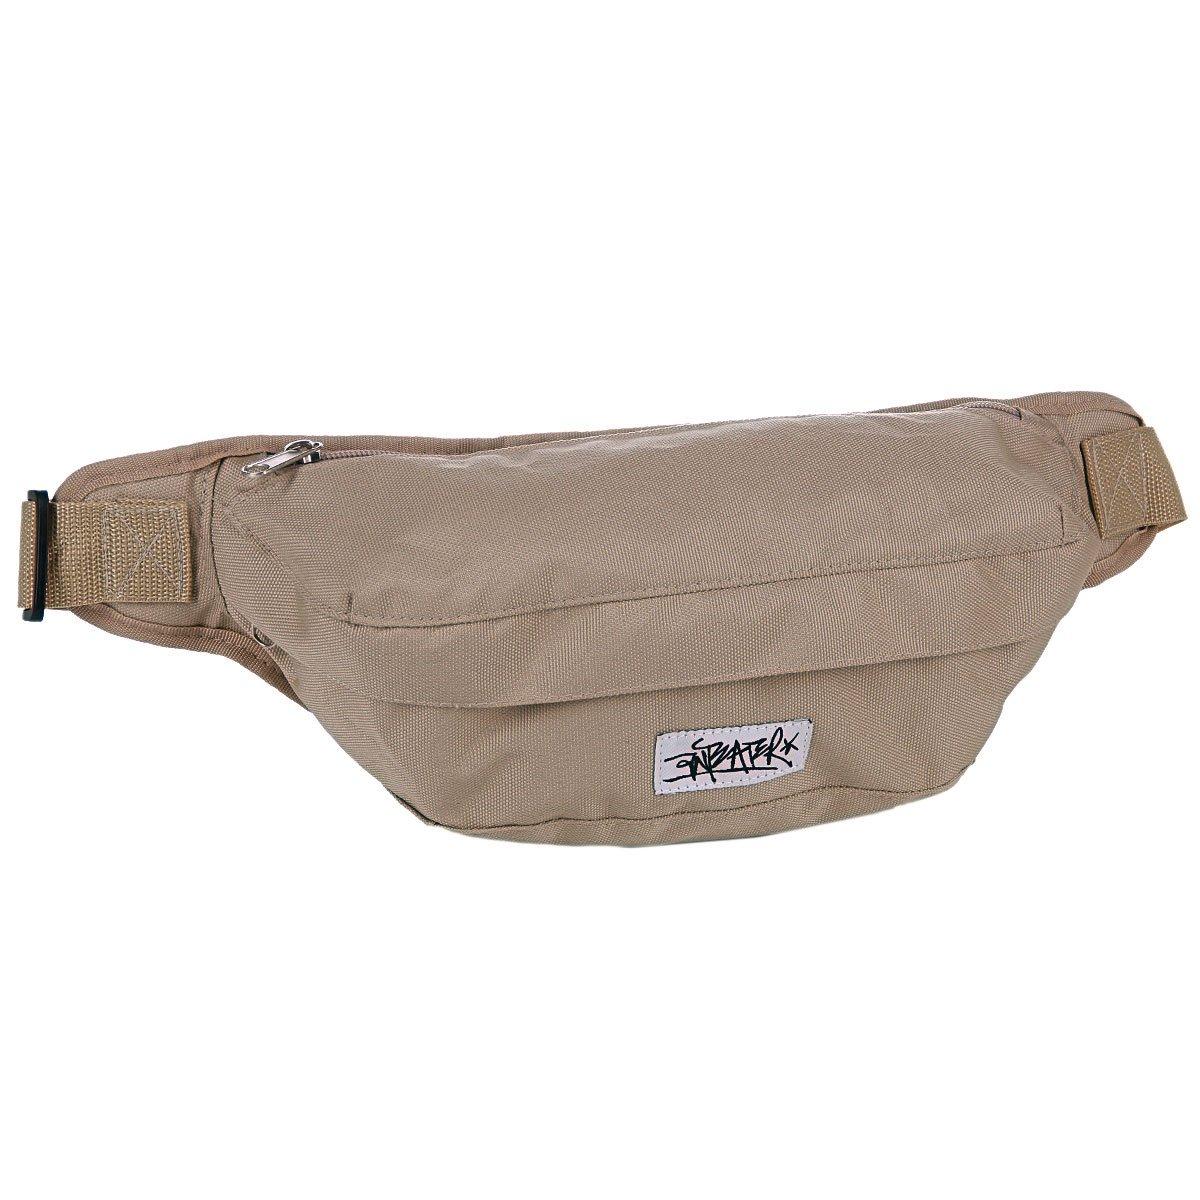 4f8d754a28e9 Купить сумку поясная Anteater Mini Bag Desert (010812nike03) в ...